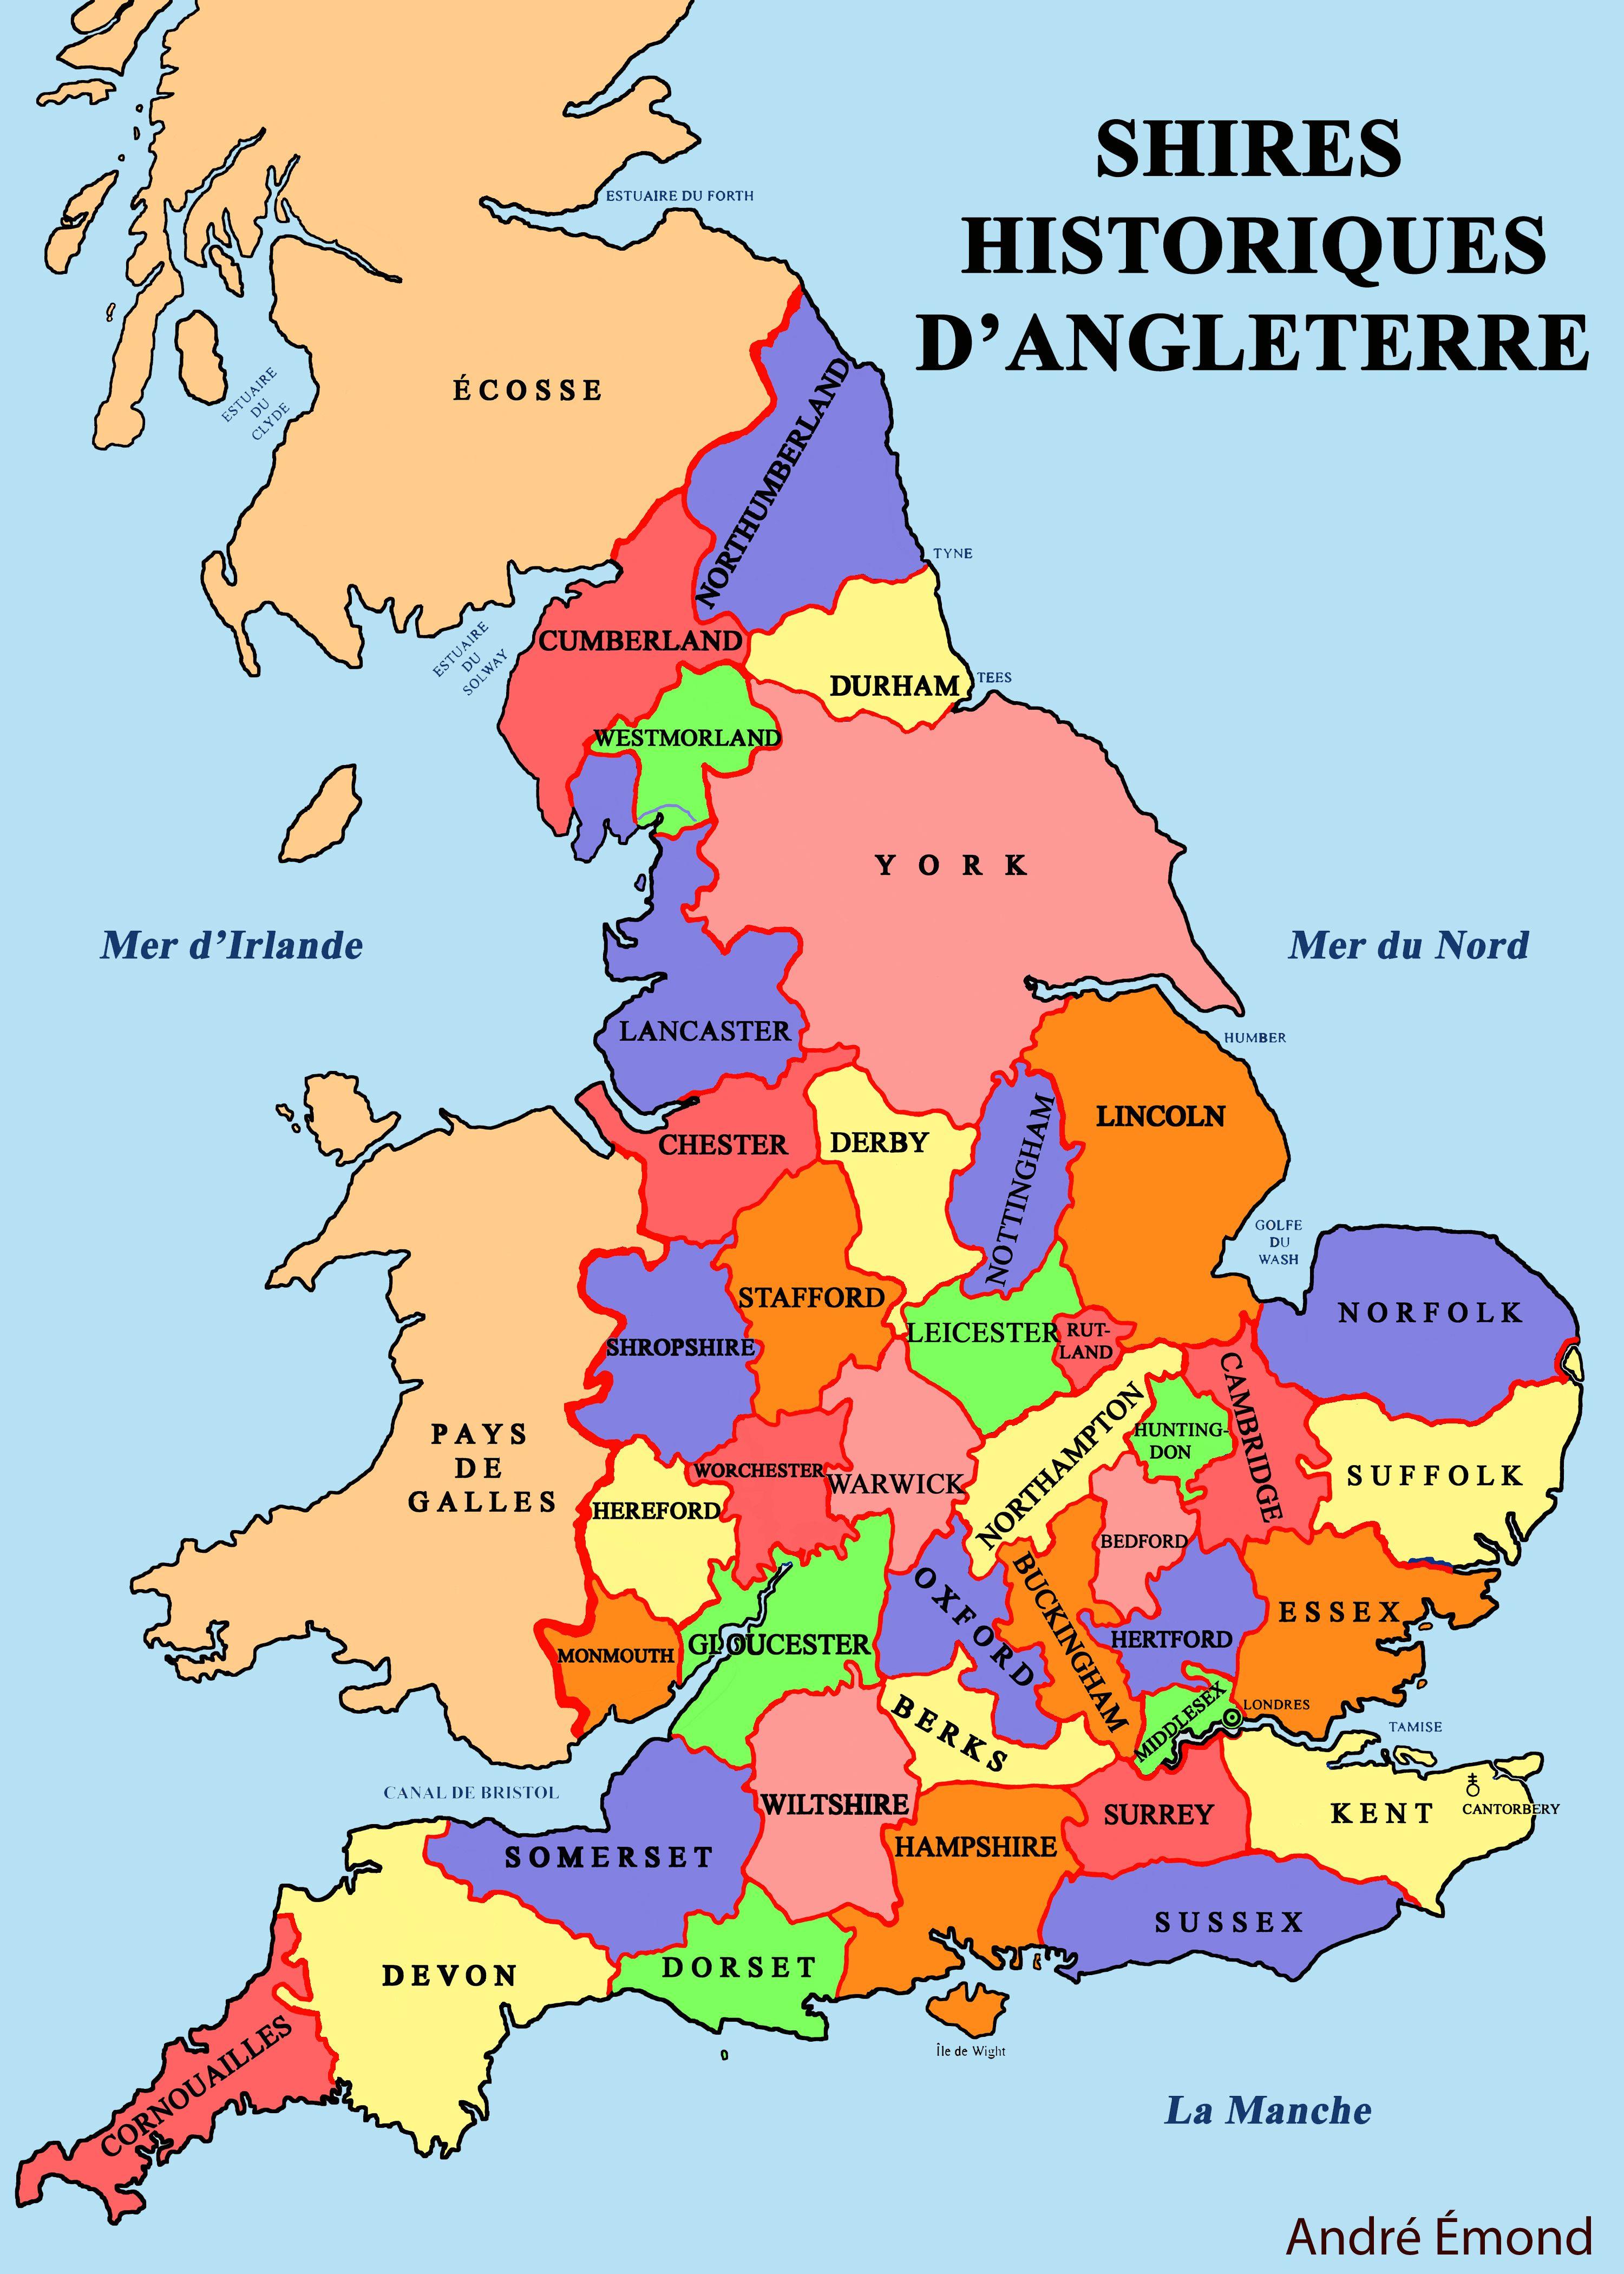 carte-angleterre-regions